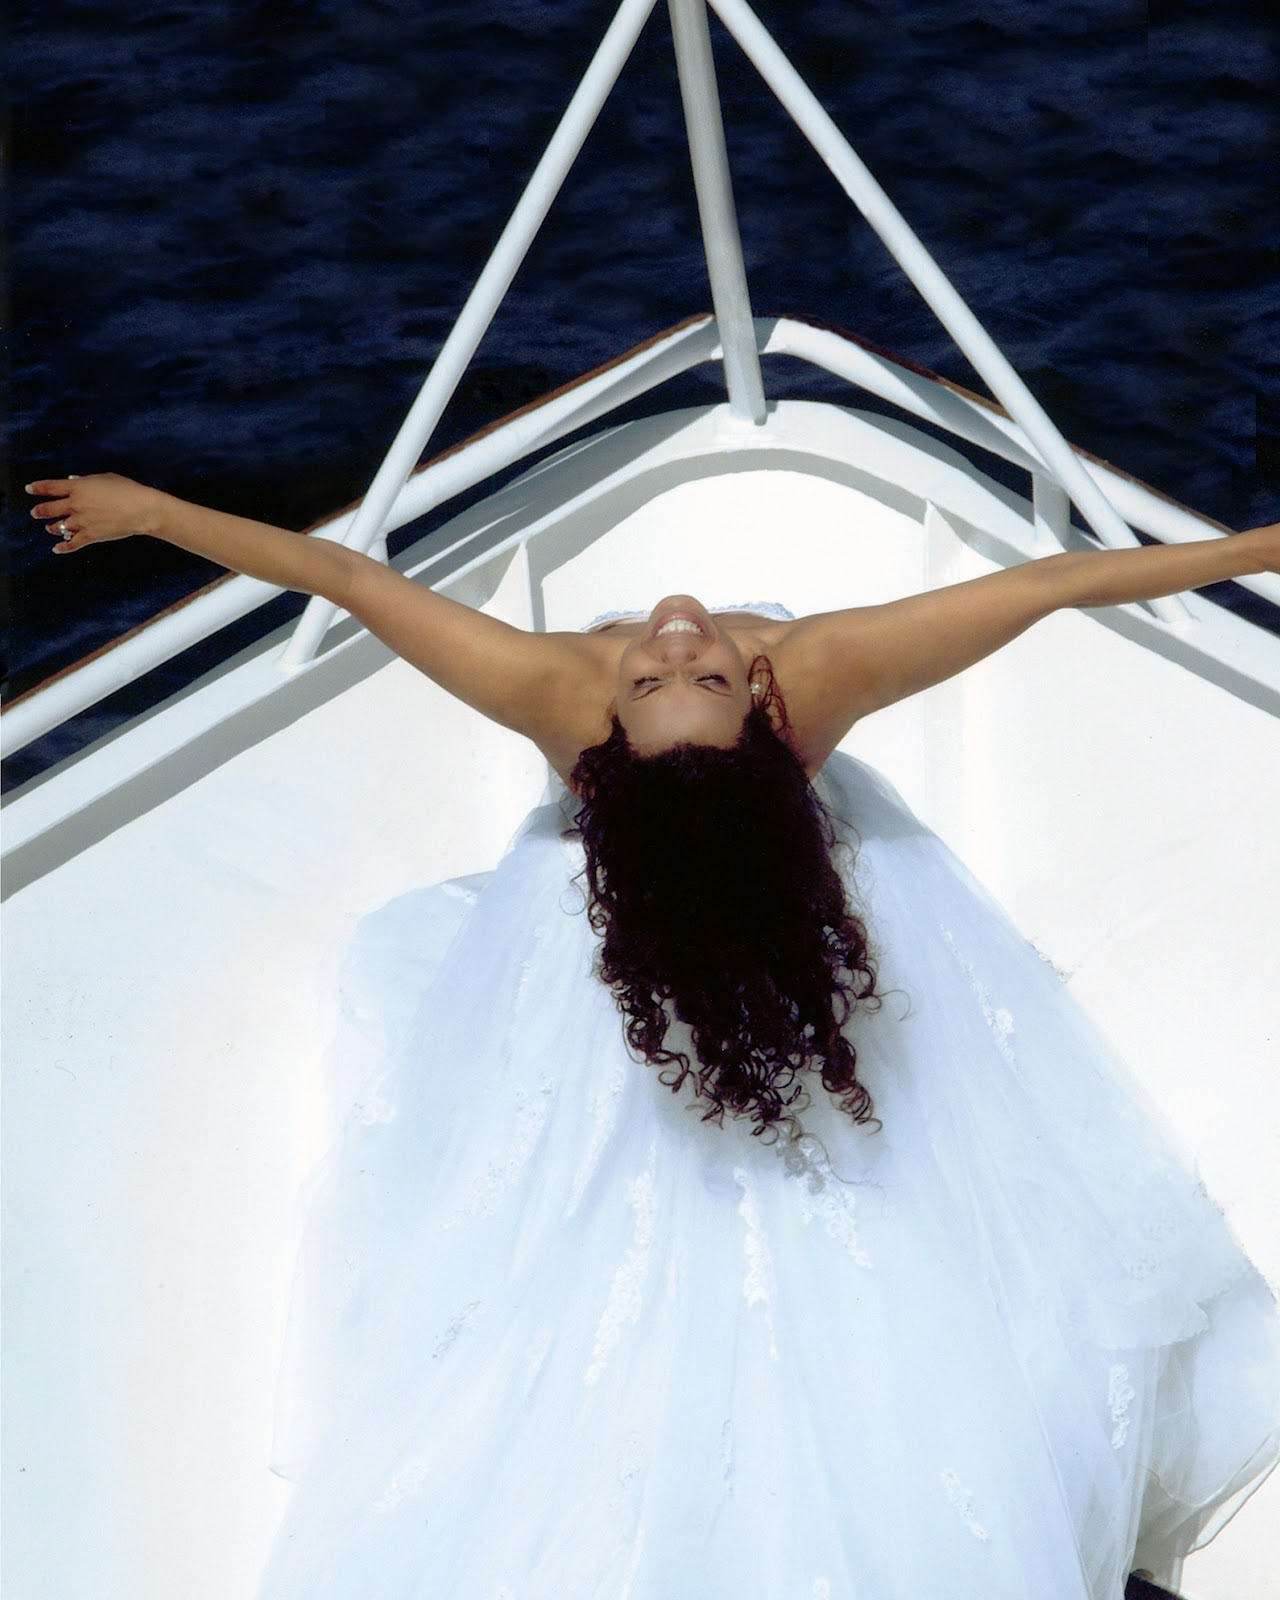 Bridal Gowns Orange County Mission Viejo Ca : Orange county bride magazine gt bridal showplace show